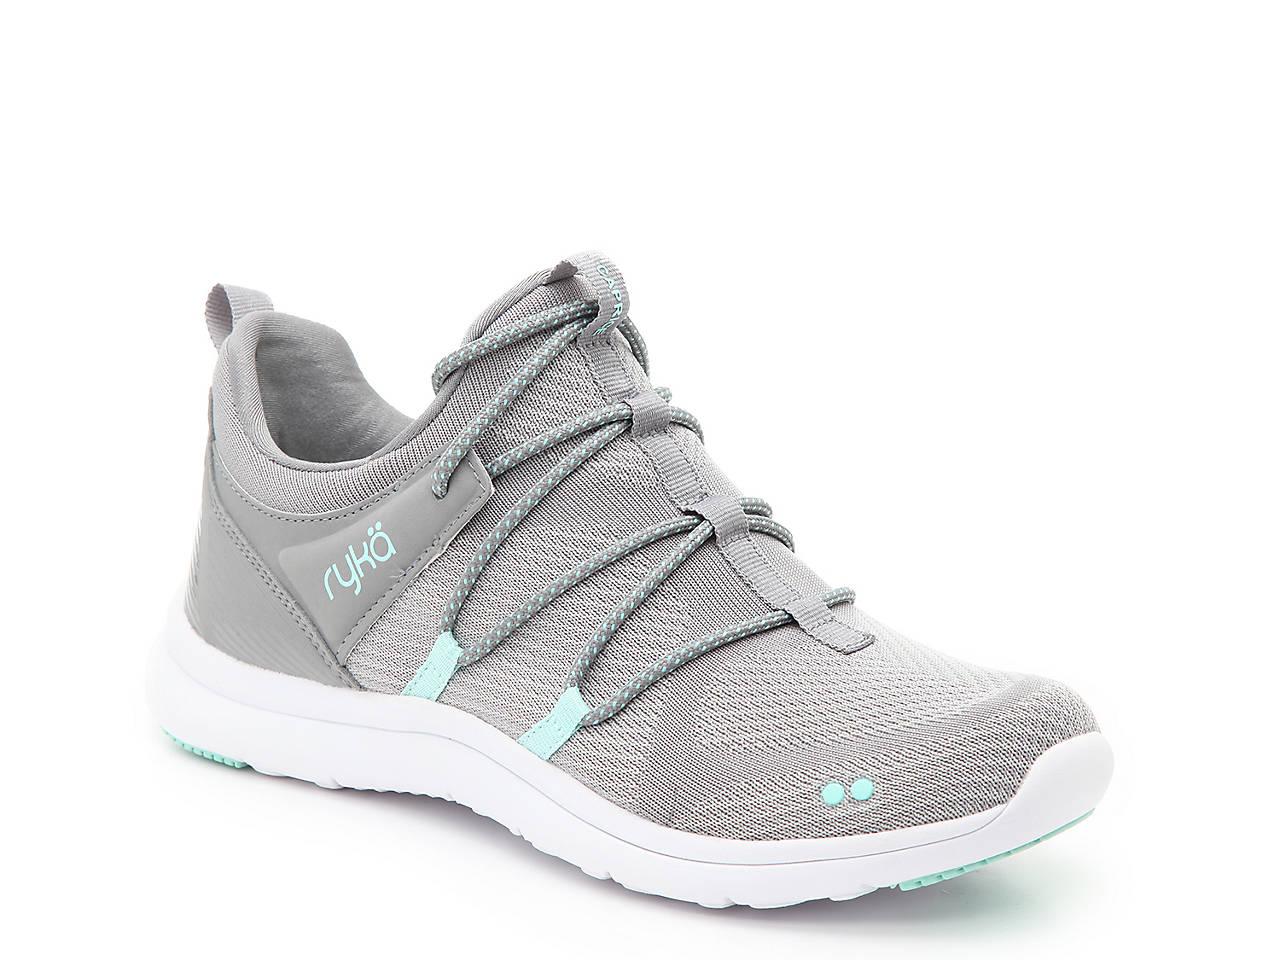 Ryka Caprice Walking Shoe Skmv0QuYQ3